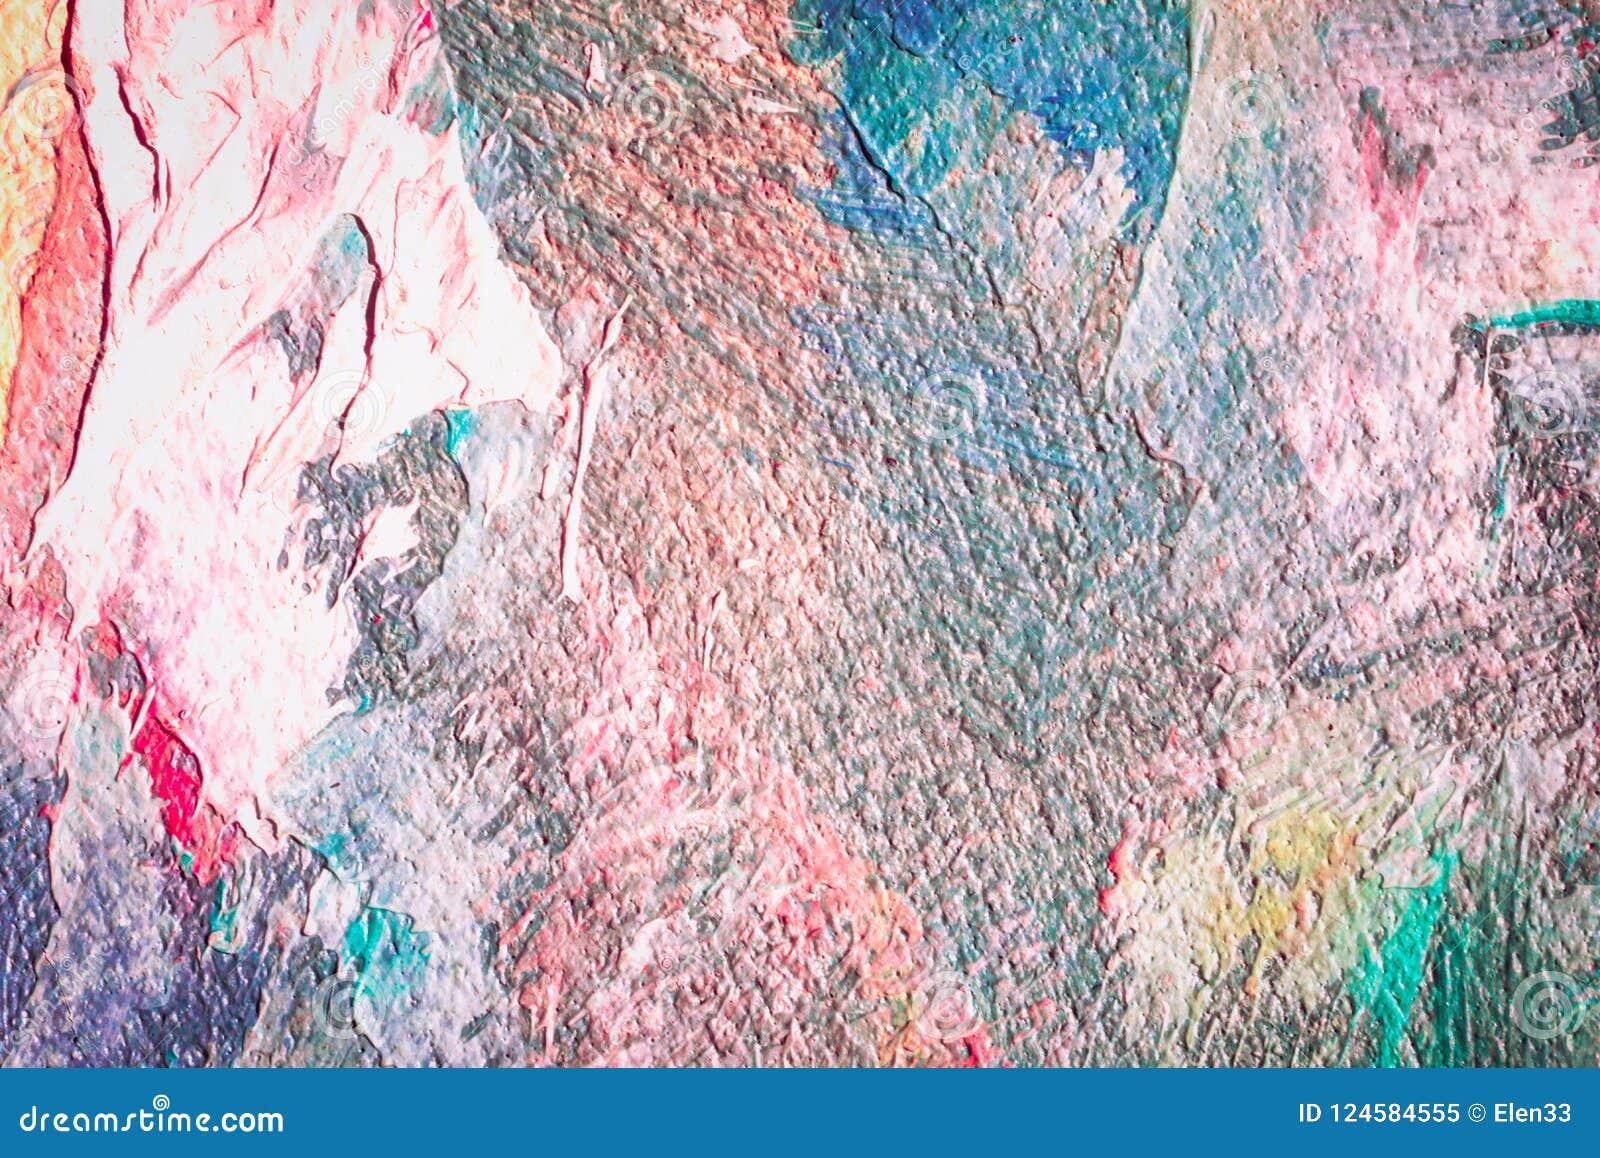 Carta Da Parati O Pittura.Carta Da Parati Astratta Di Struttura Della Pittura A Olio Immagine